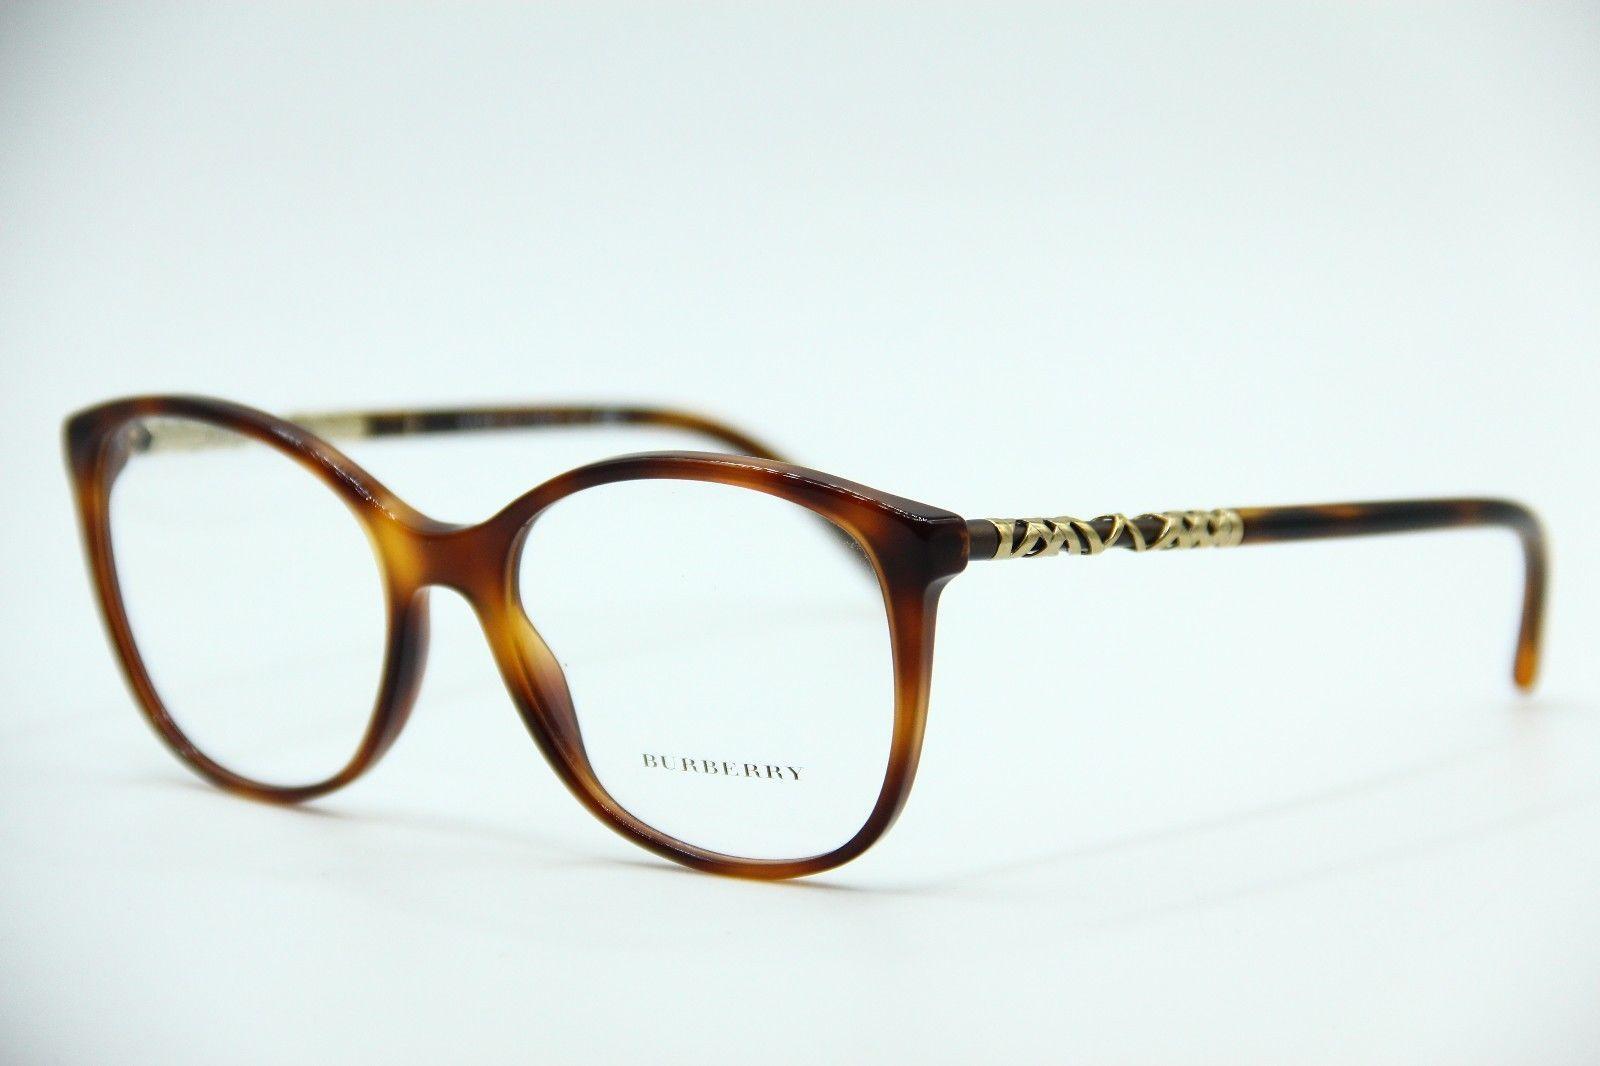 c38236ab05df New Burberry B 2245 3316 Havana Eyeglasses and 50 similar items. 57